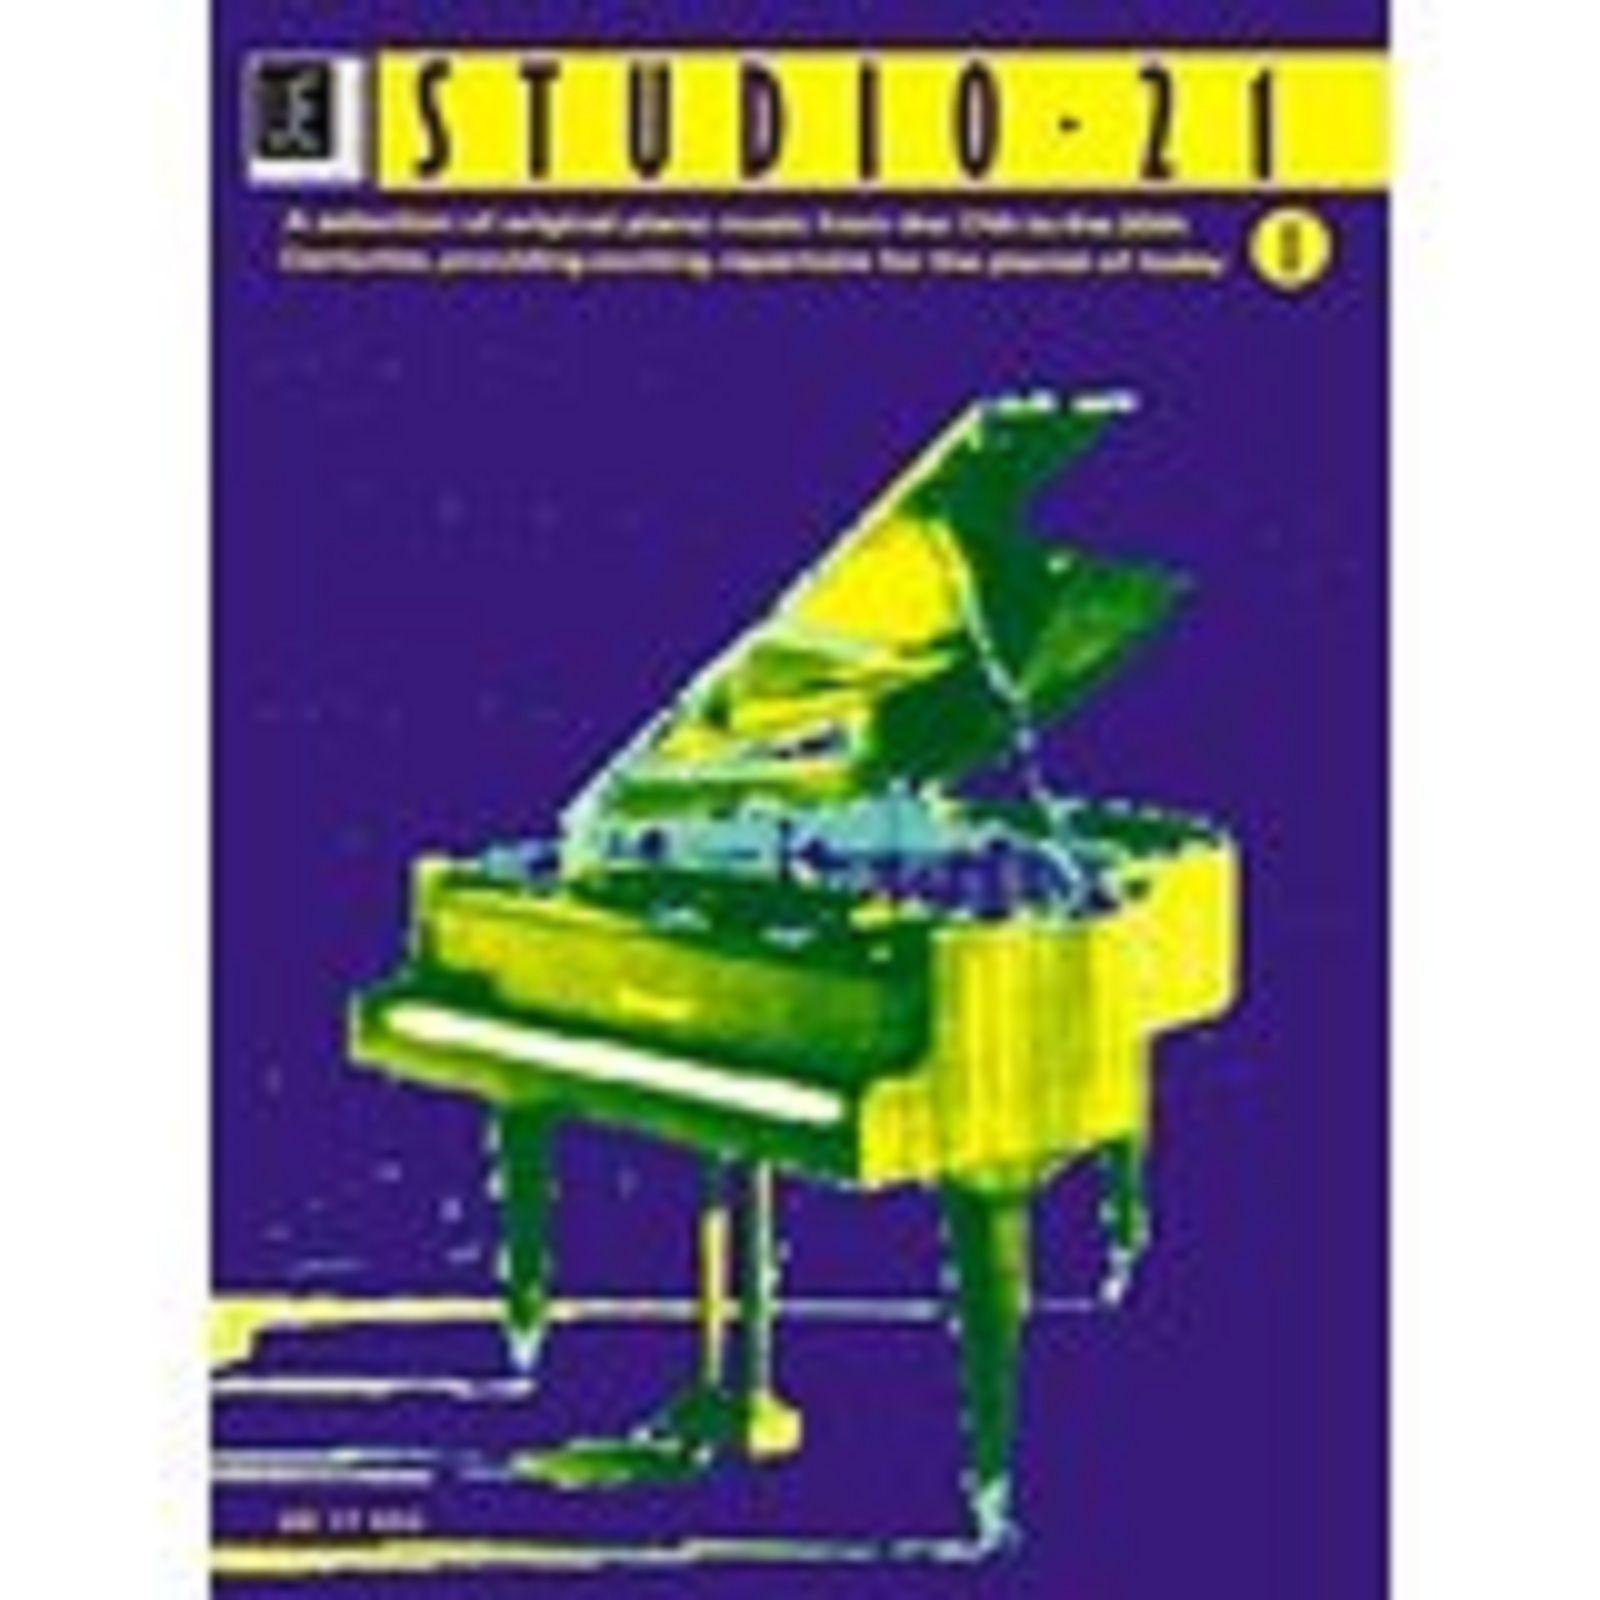 Studio 21 Piano Sheet Music Repertoire 17th-20th Century